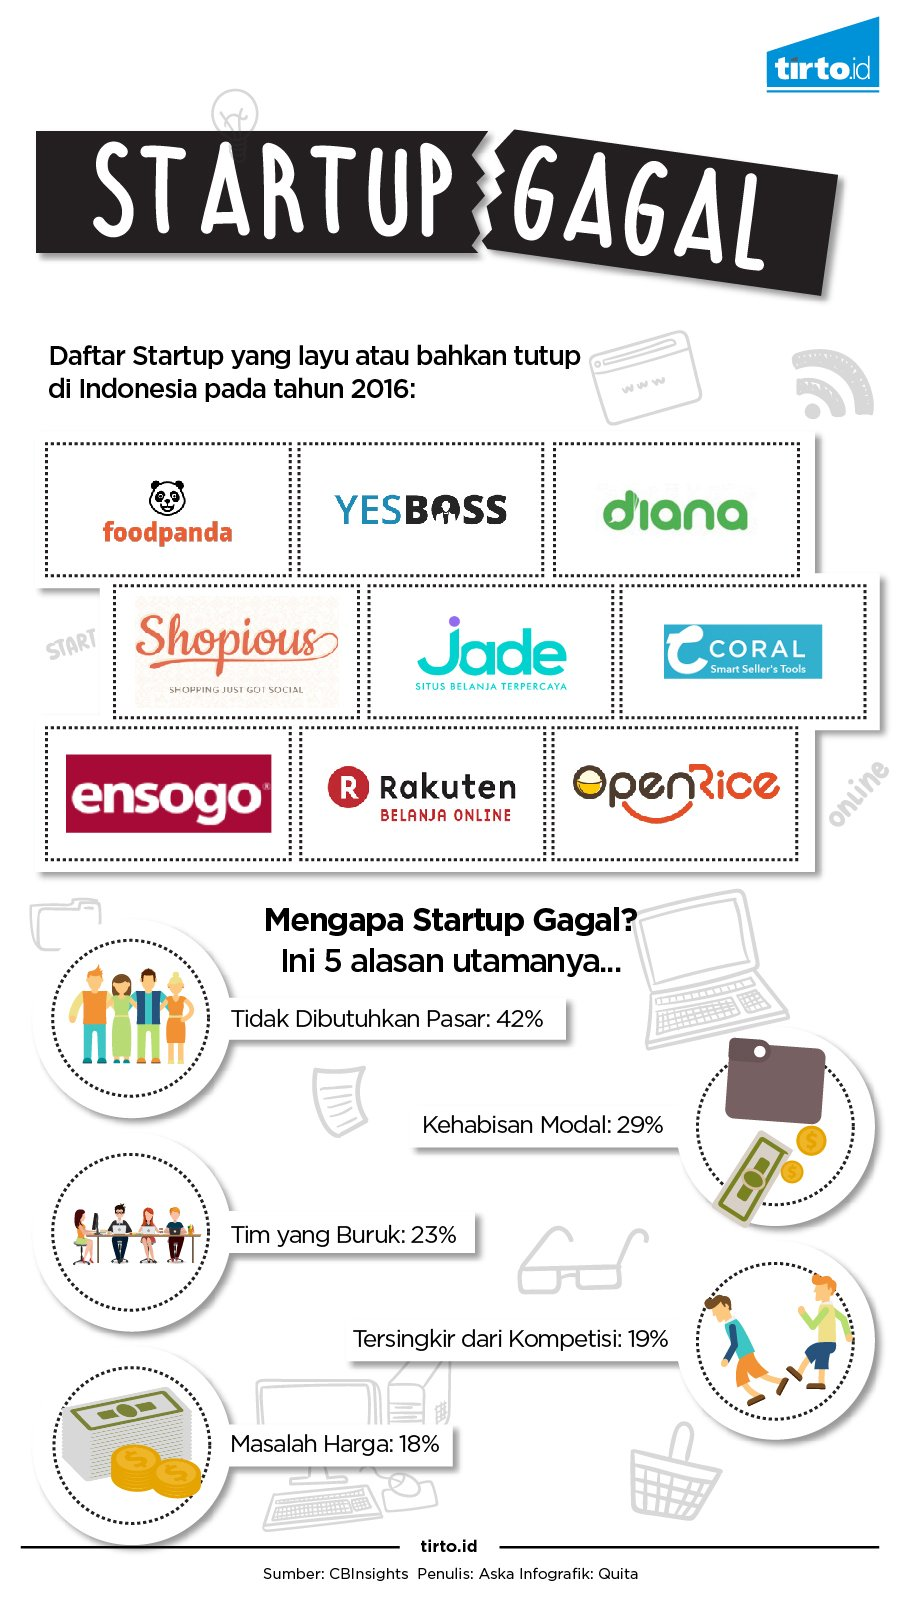 Mengapa Foodpanda dan Beberapa Start-up Lain Gagal? - Tirto.ID